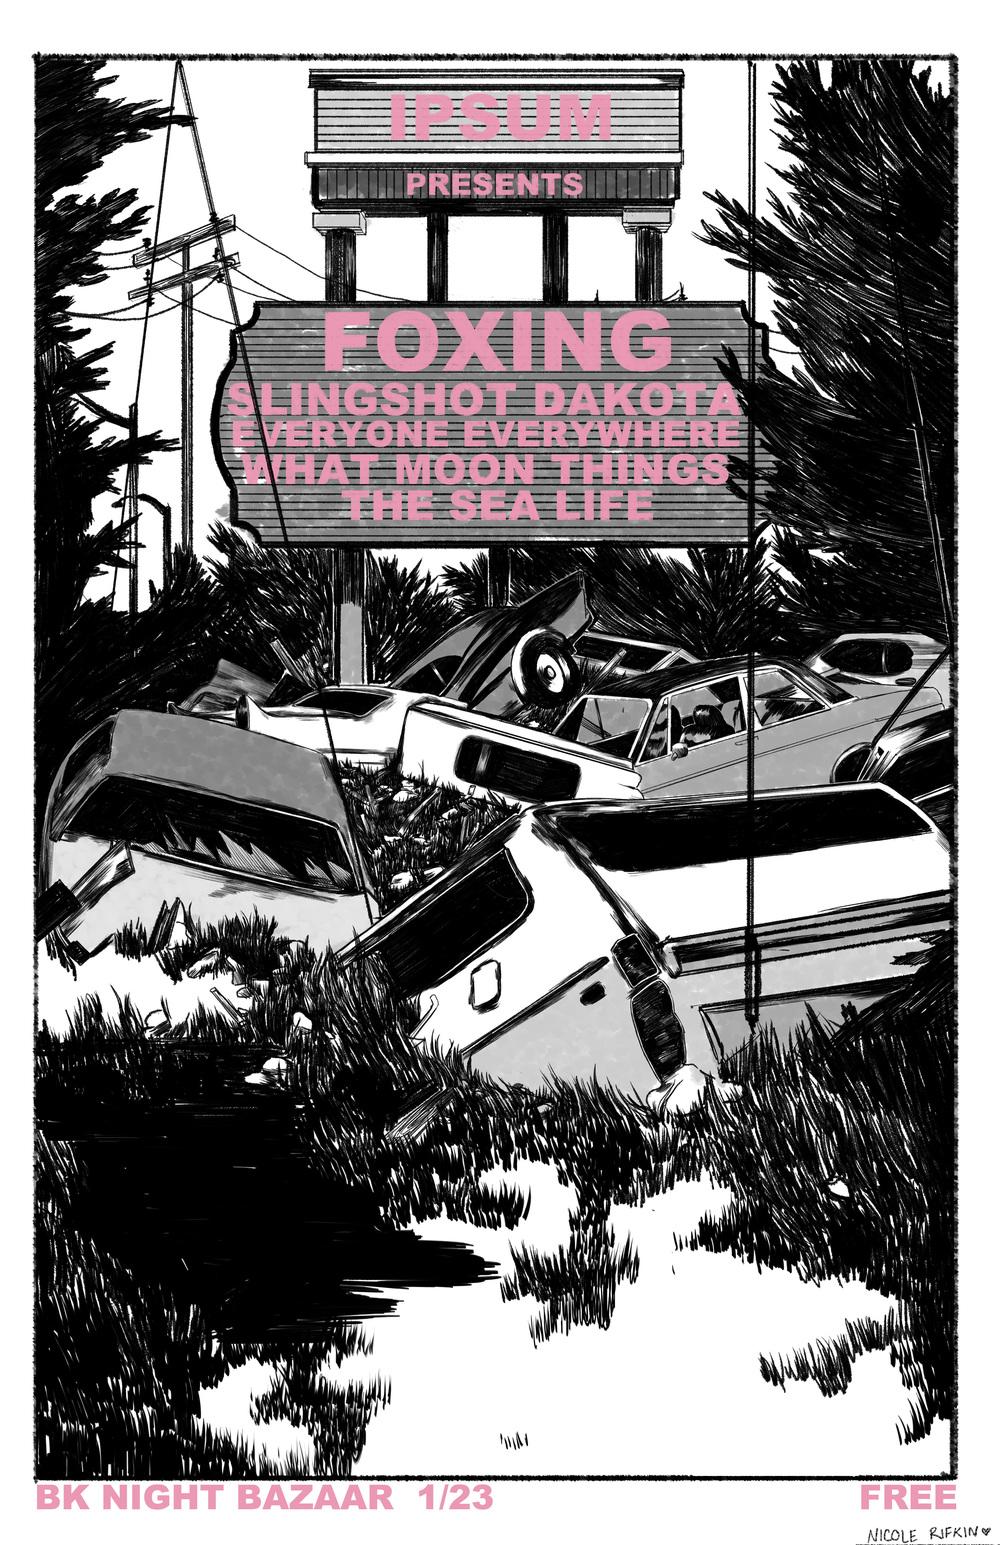 foxing_3300.jpg